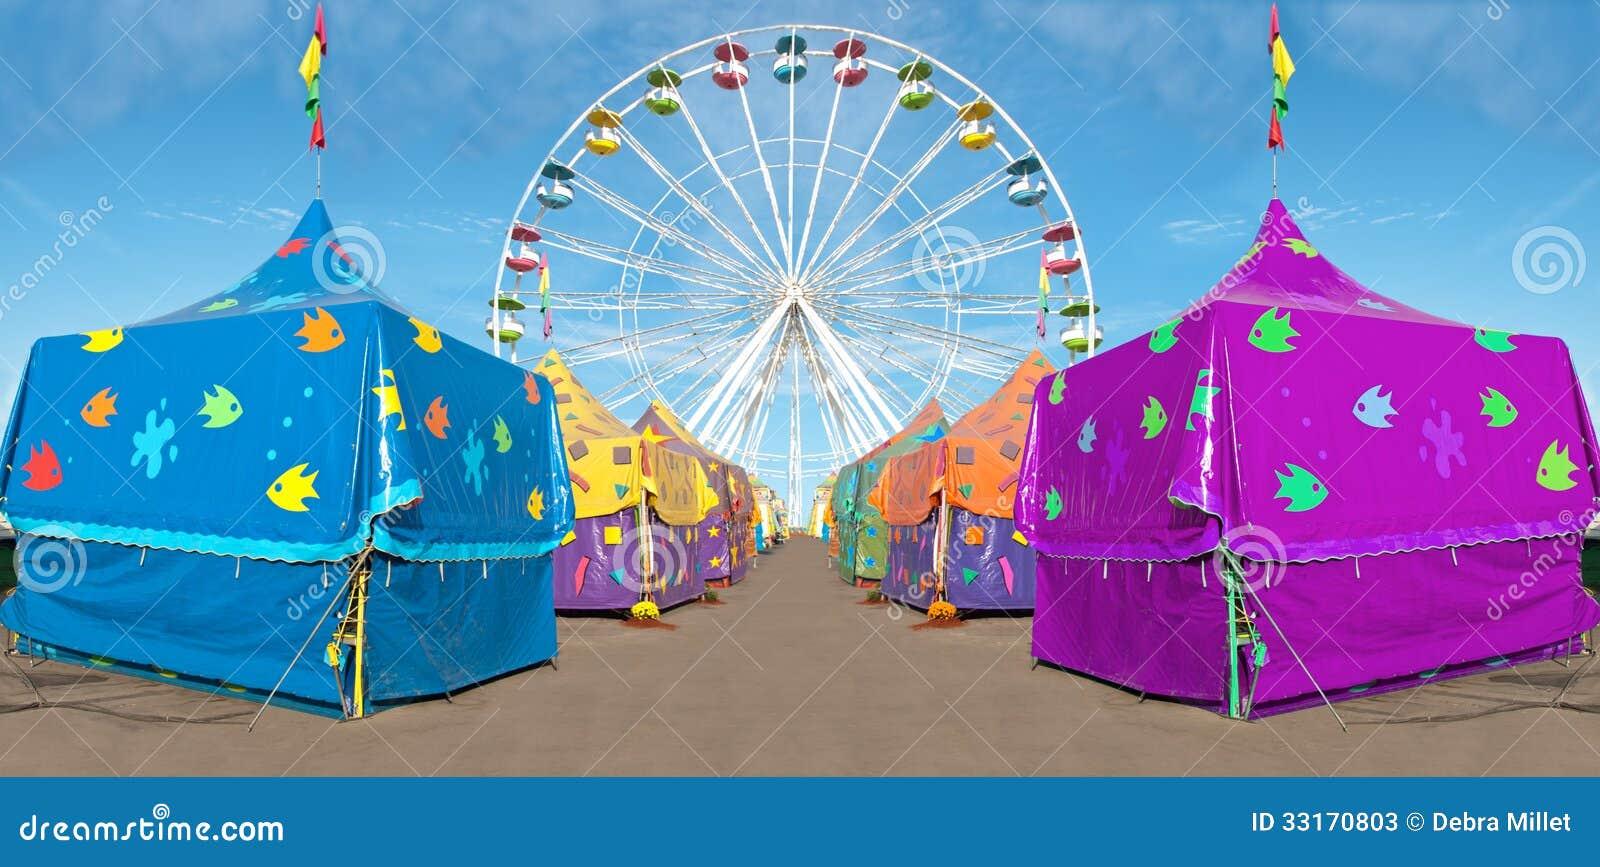 Barracas do carnaval